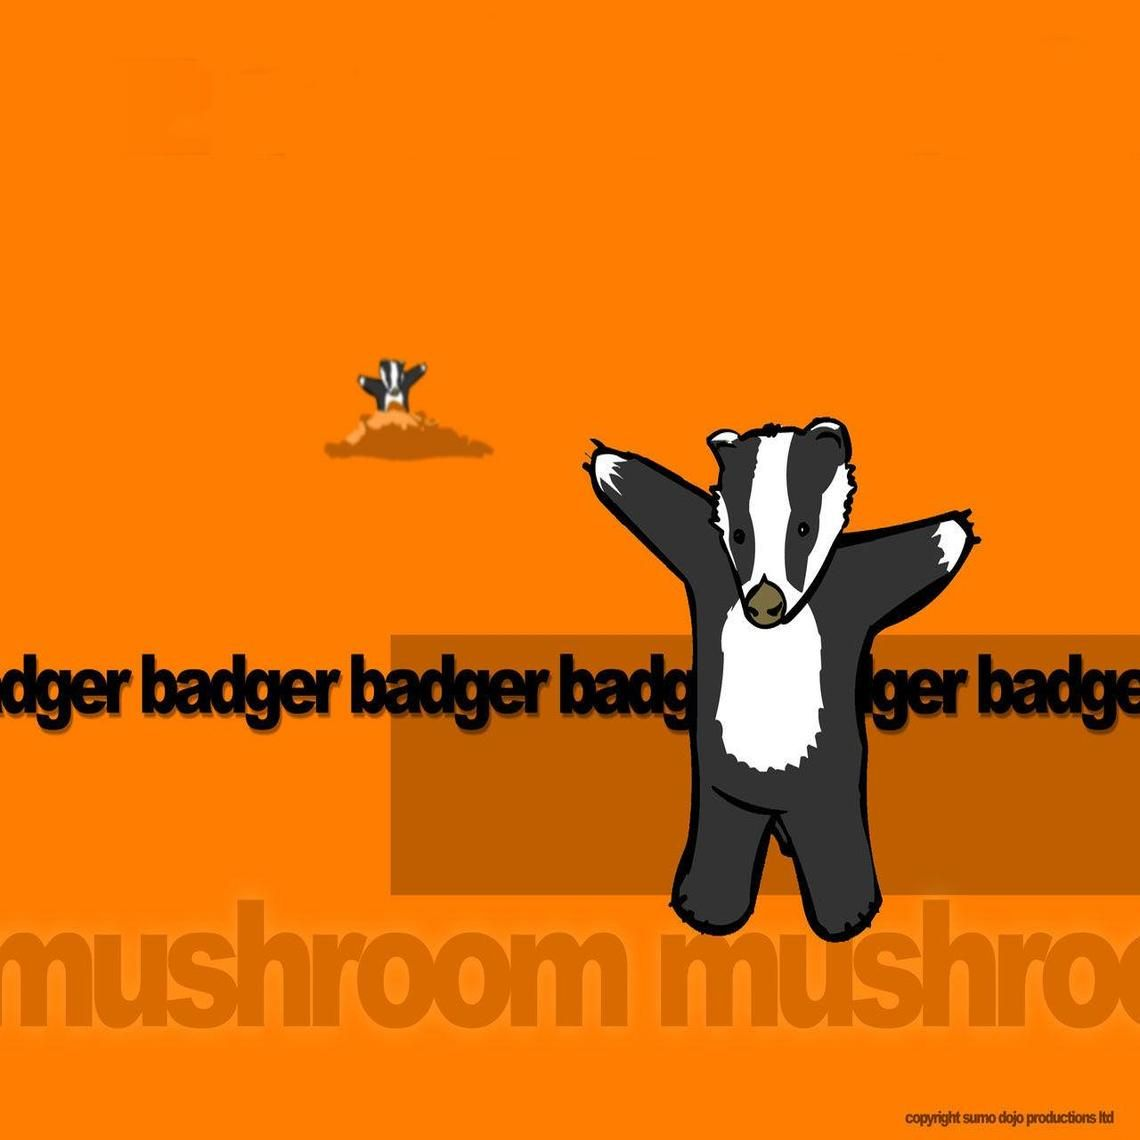 Badger Badger Badger Badger